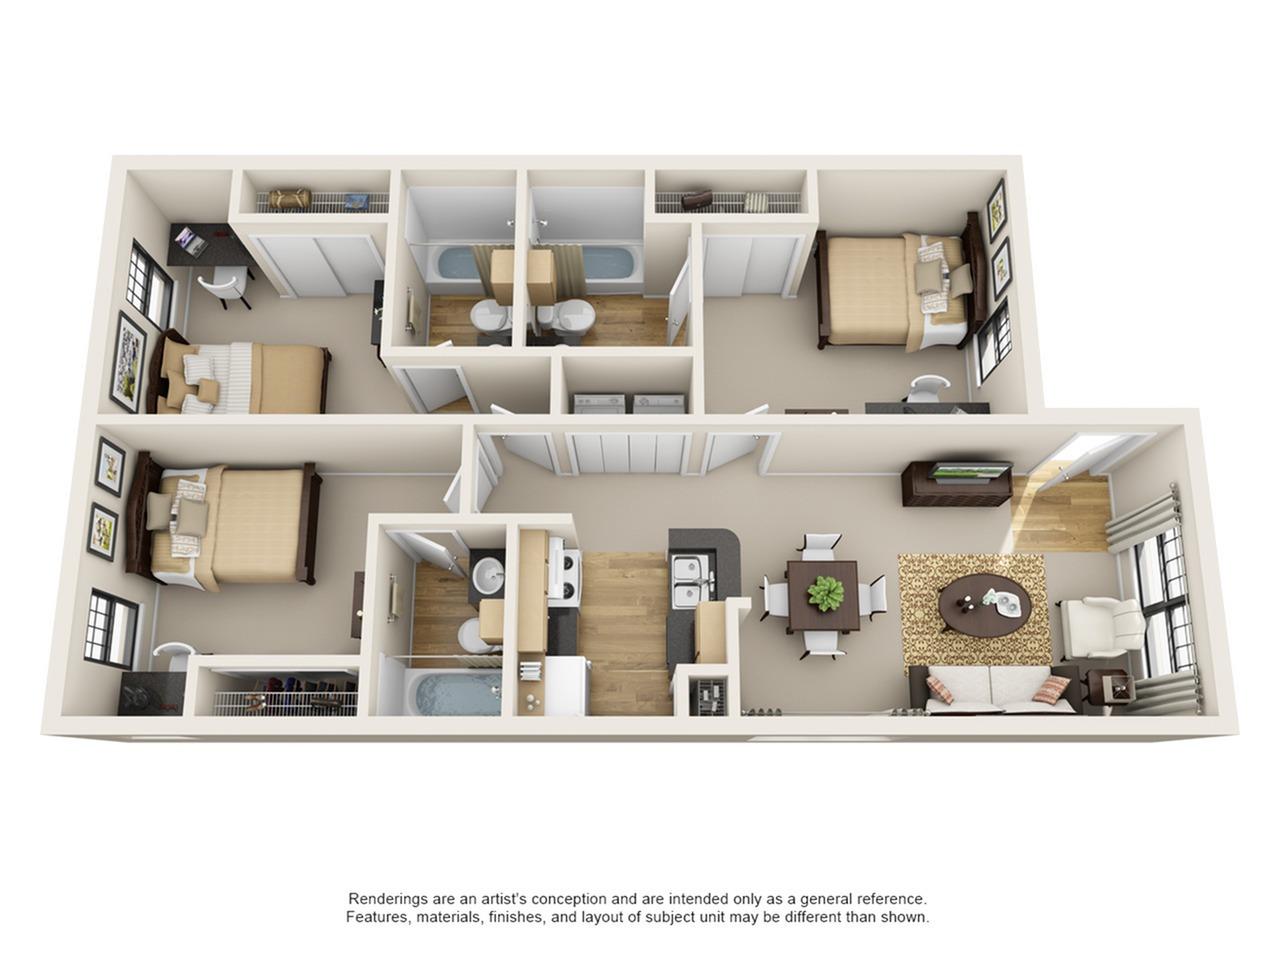 3 bedroom apartment baton rouge